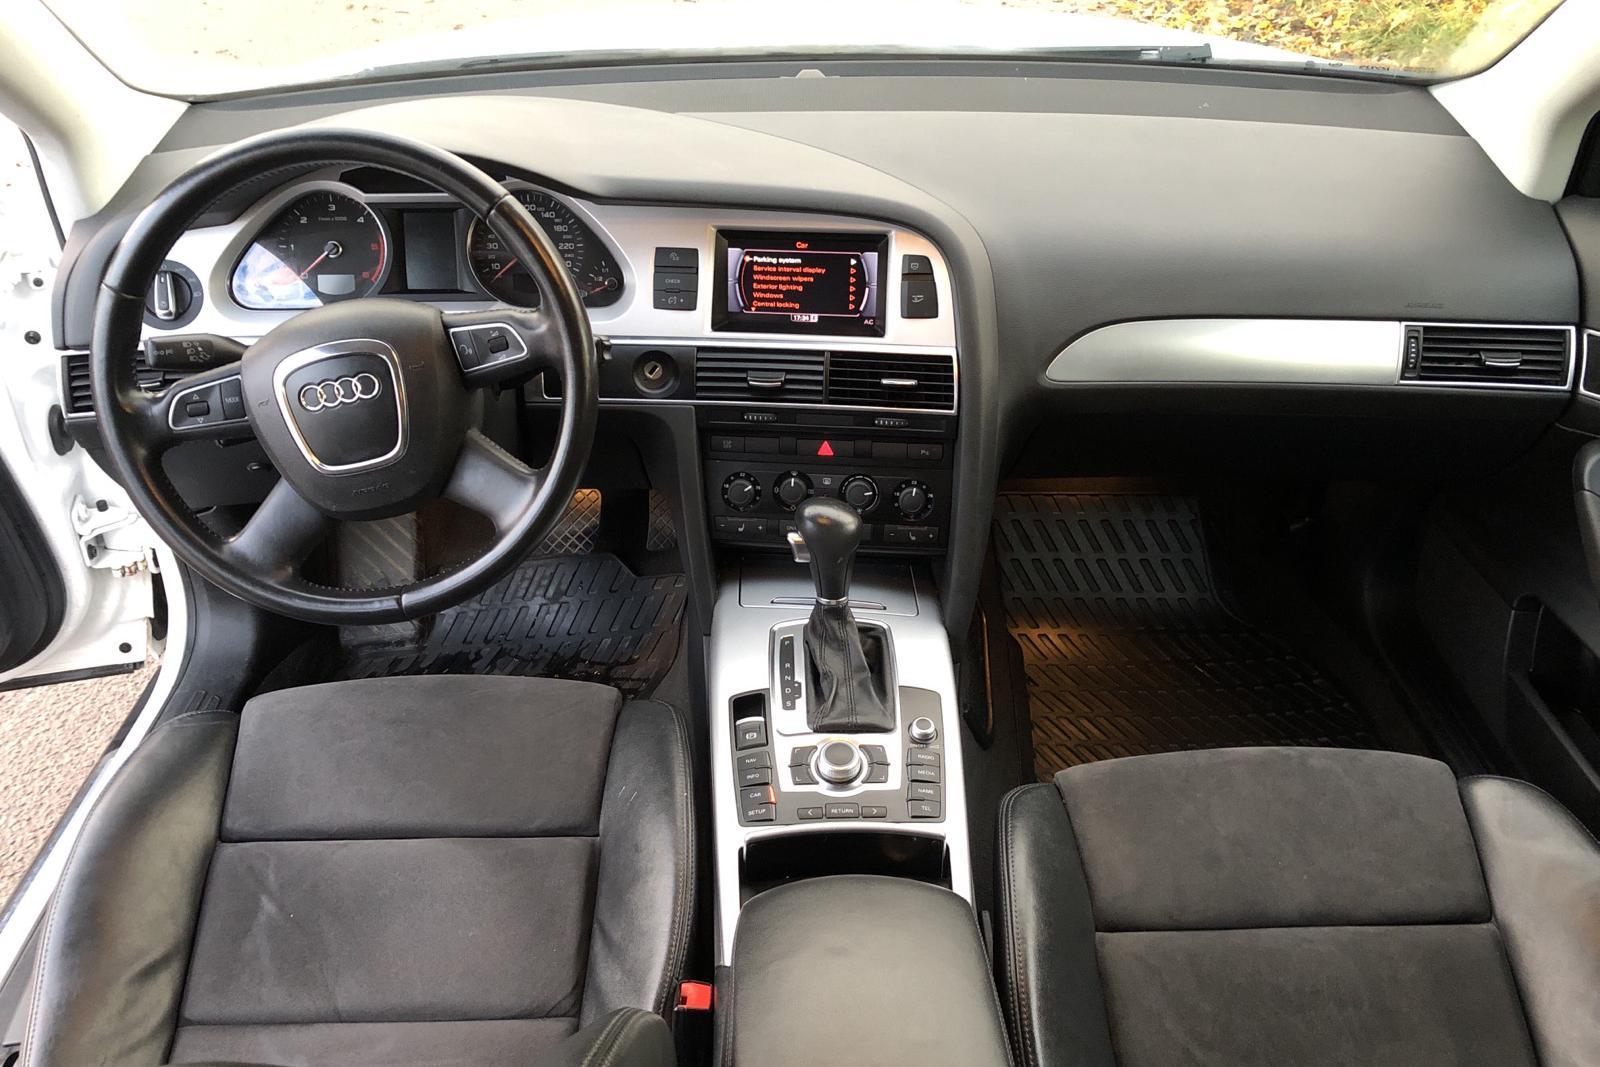 Audi A6 2.0 TDI Avant (170hk) - 229 860 km - Automatic - white - 2011